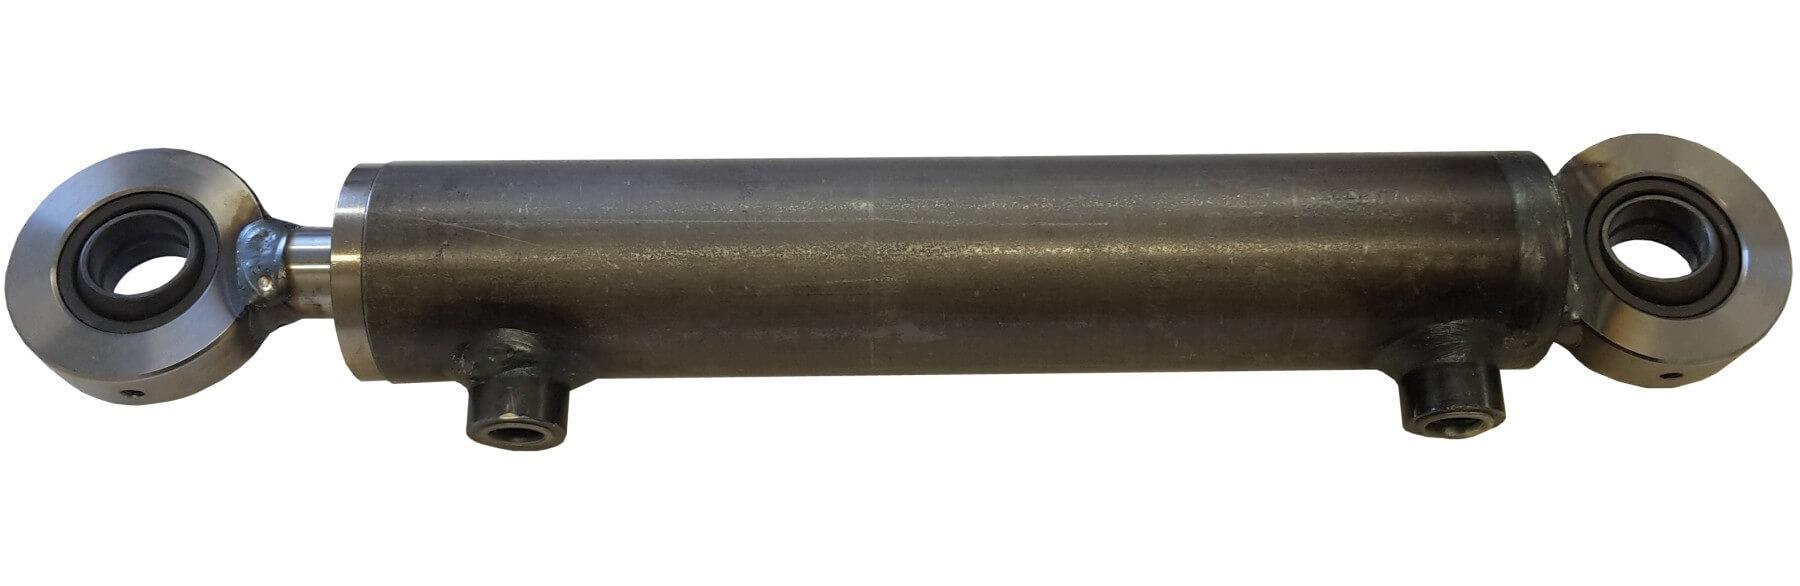 Hydraulisylinteri CL 70. 40. 800 GE